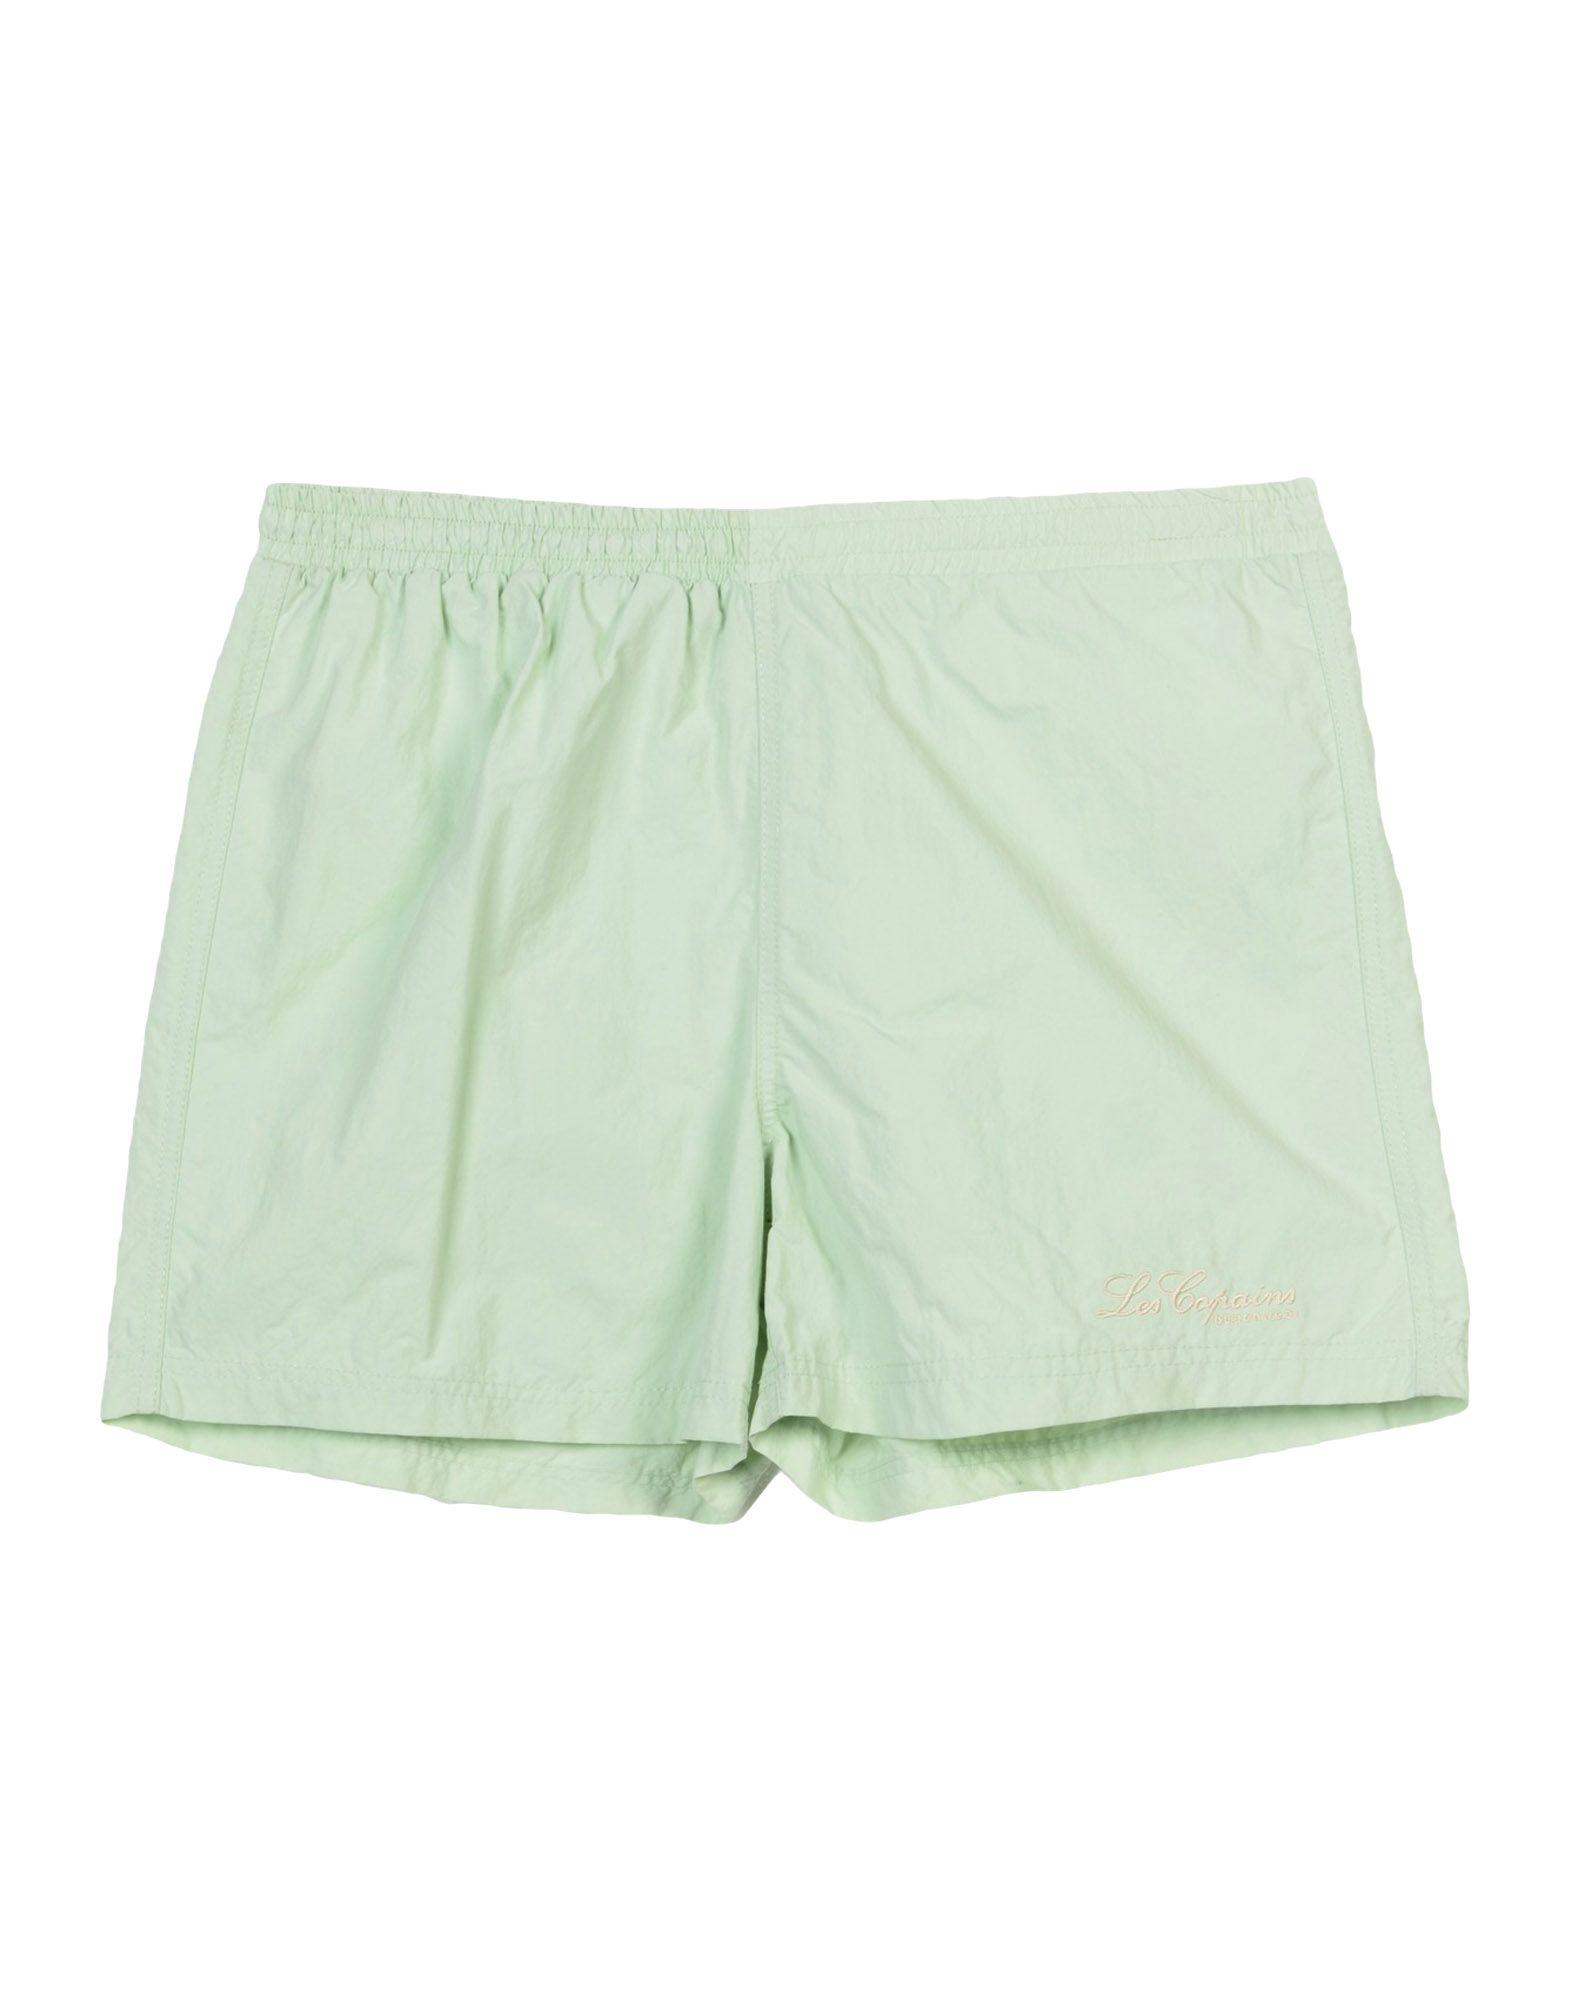 LES COPAINS BEACHWEAR Шорты для плавания move beachwear шорты для плавания